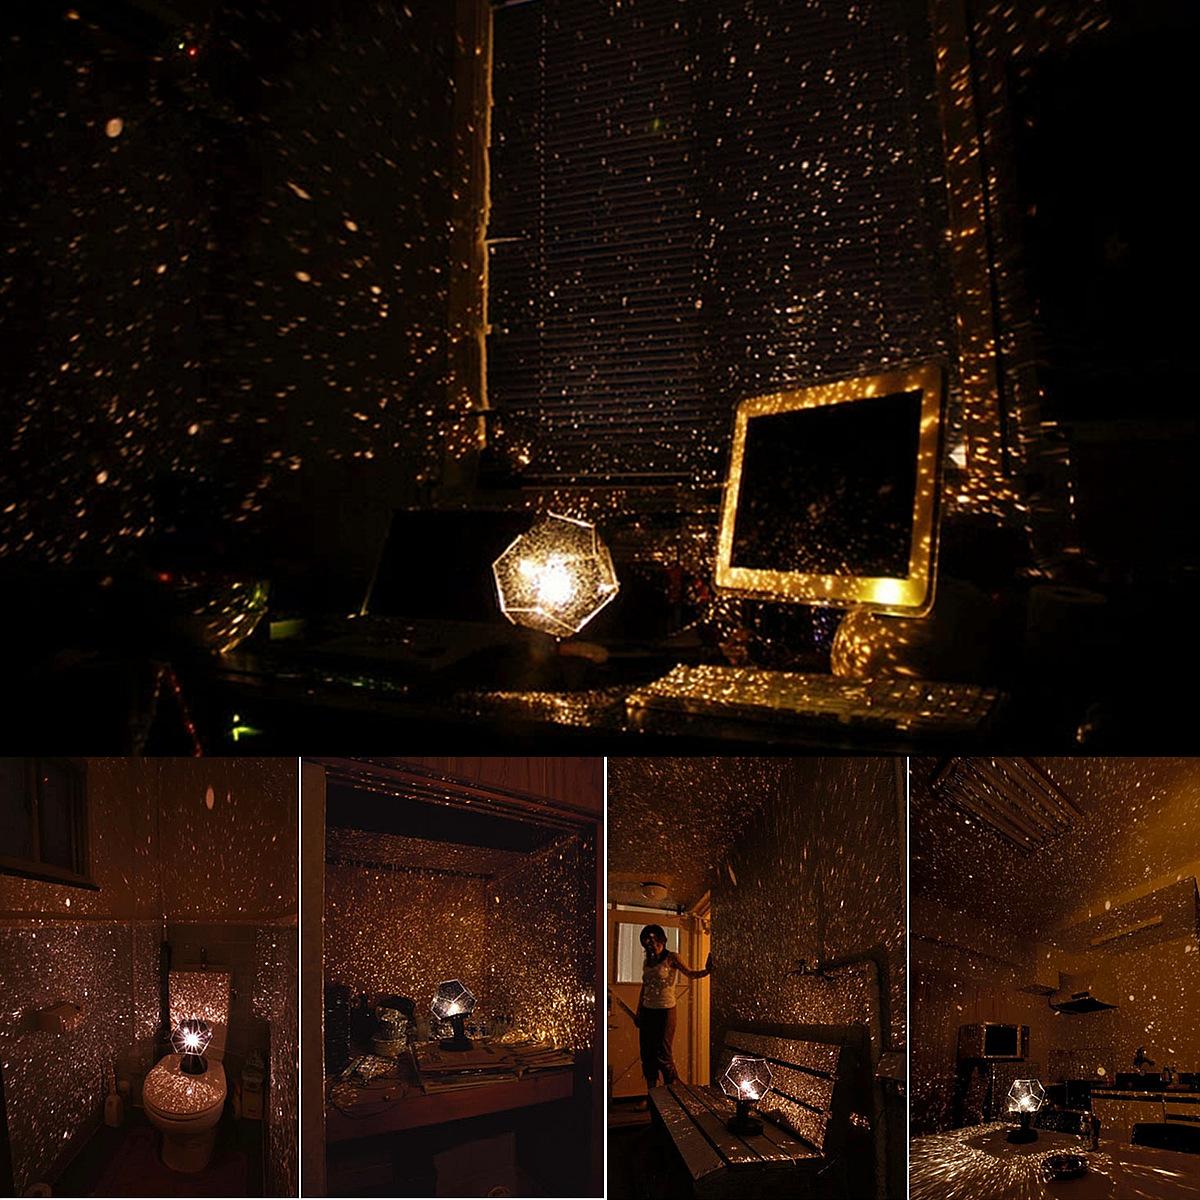 Night light projector lamp - Astro Star Galaxy Master Planetarium Projector Cosmos Night